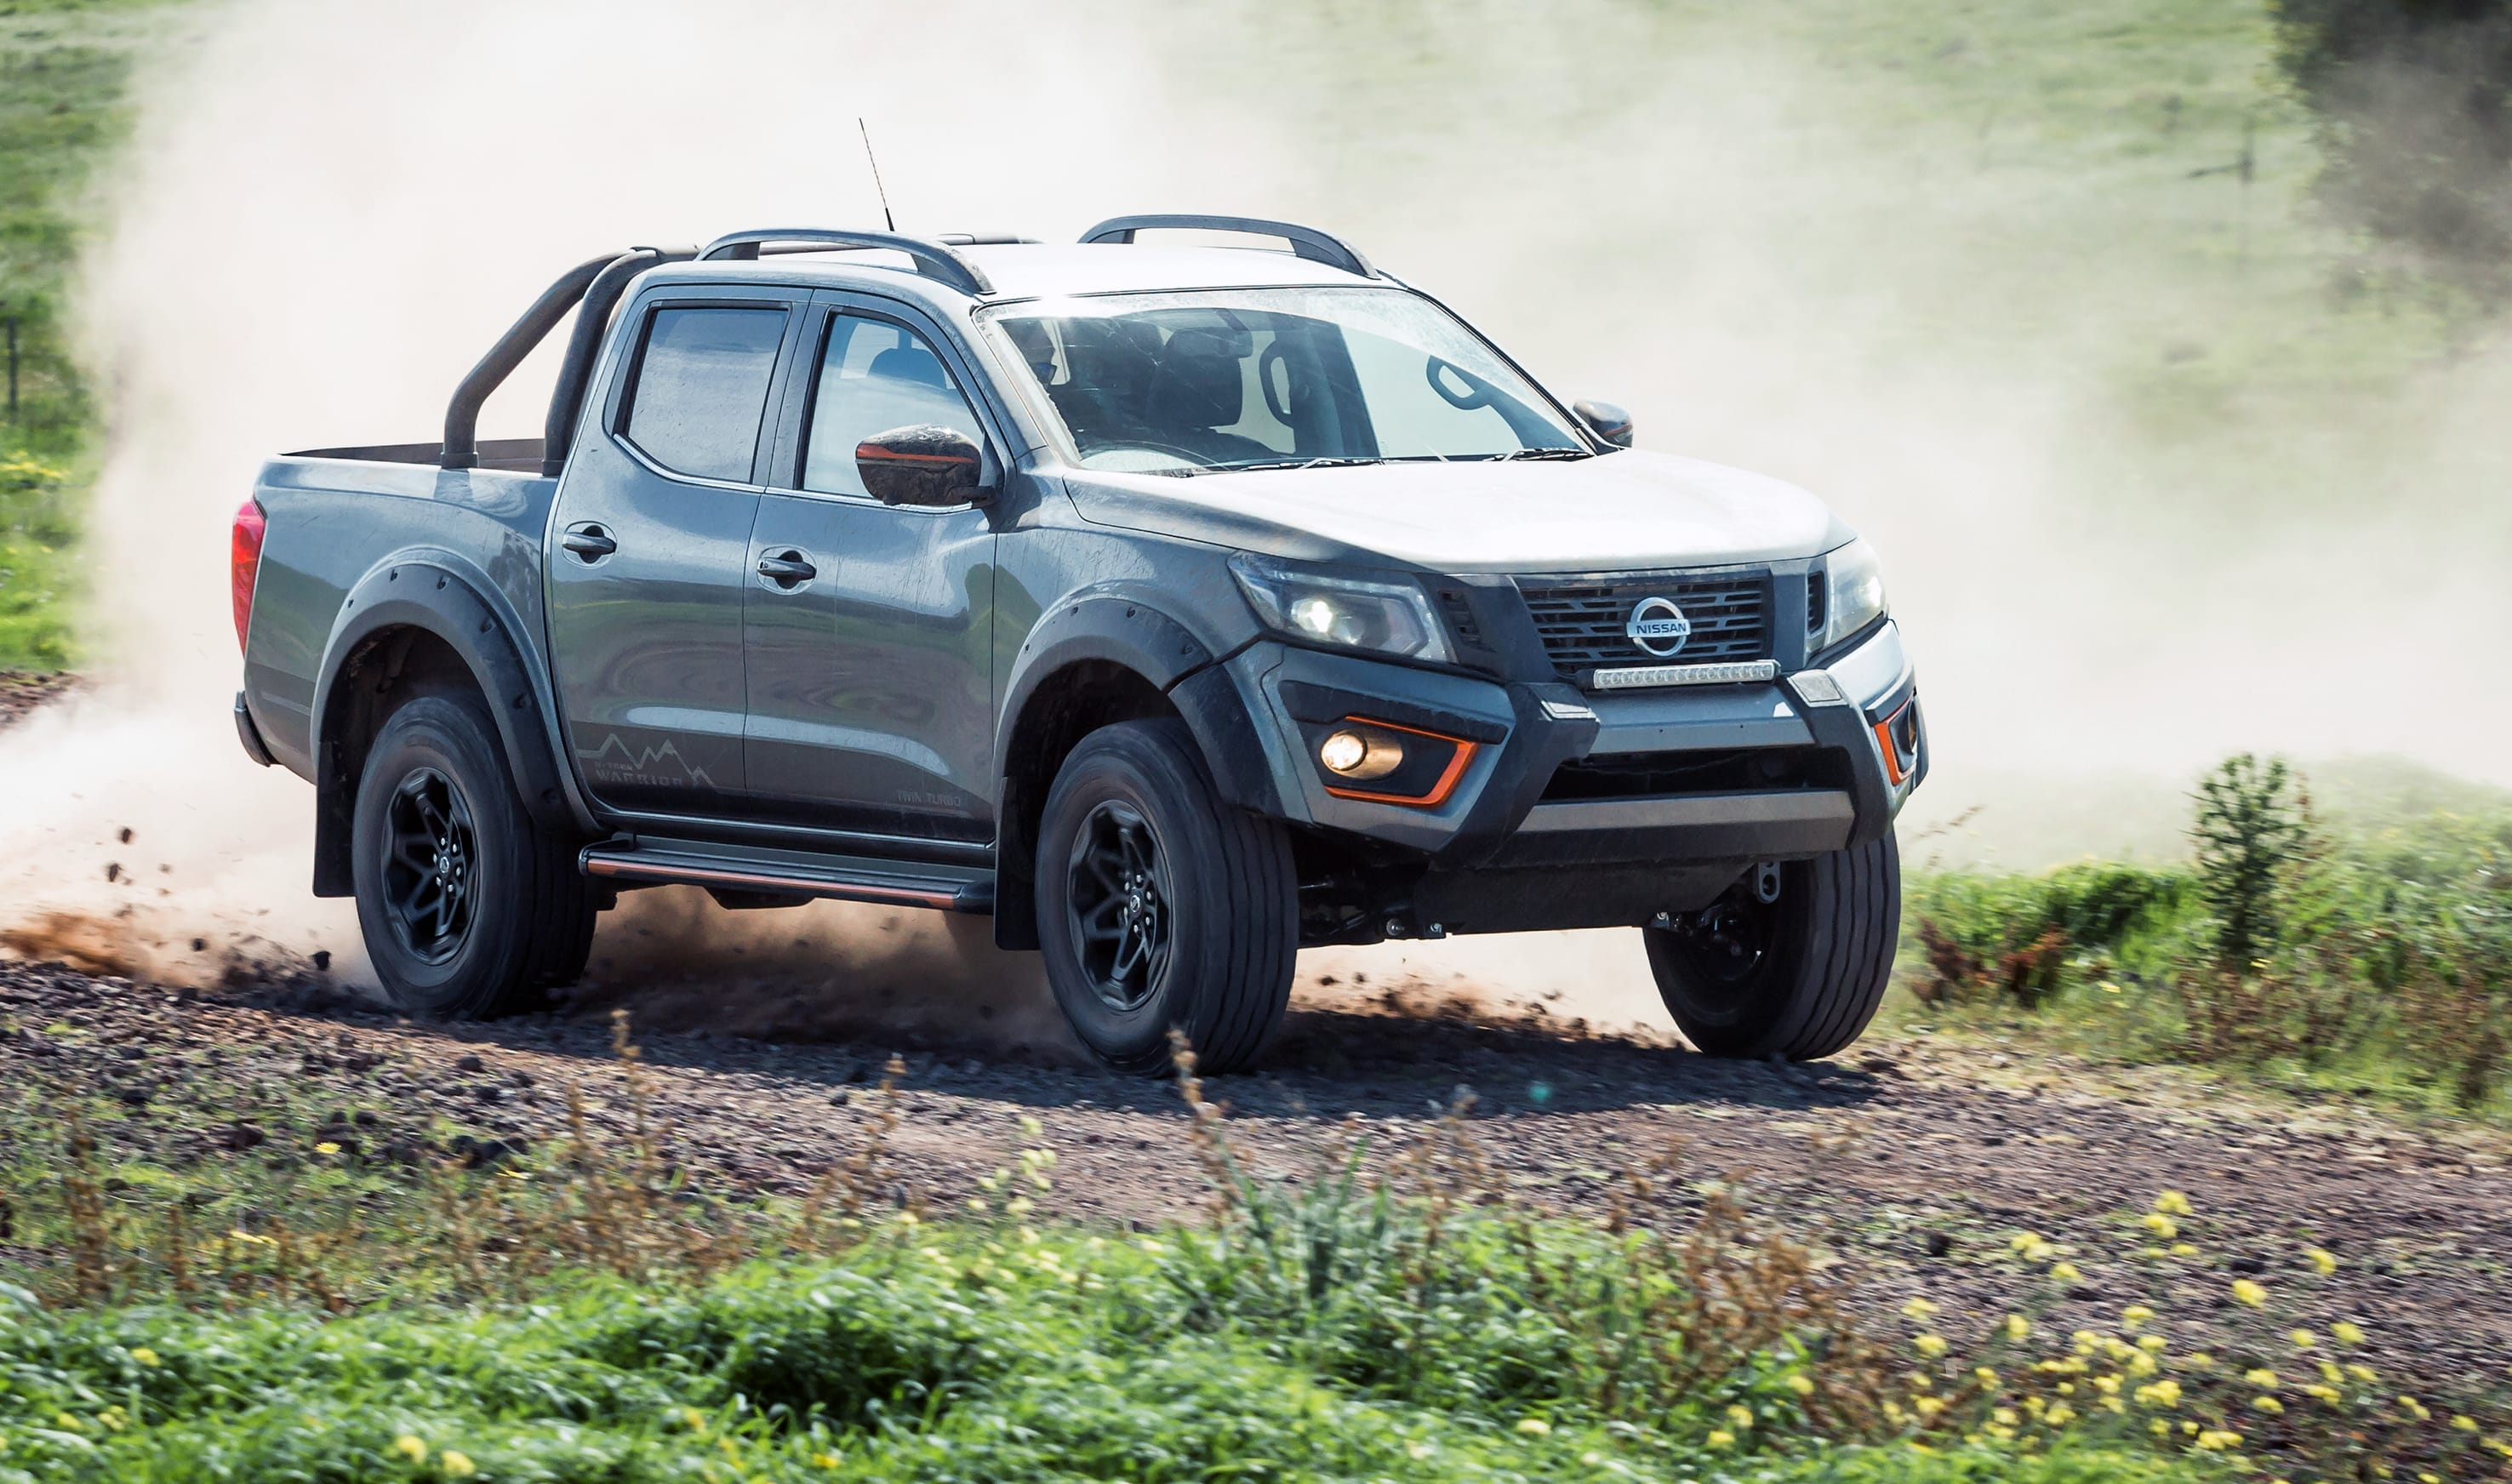 2020 Nissan Navara N Trek Warrior Review Suspension Test